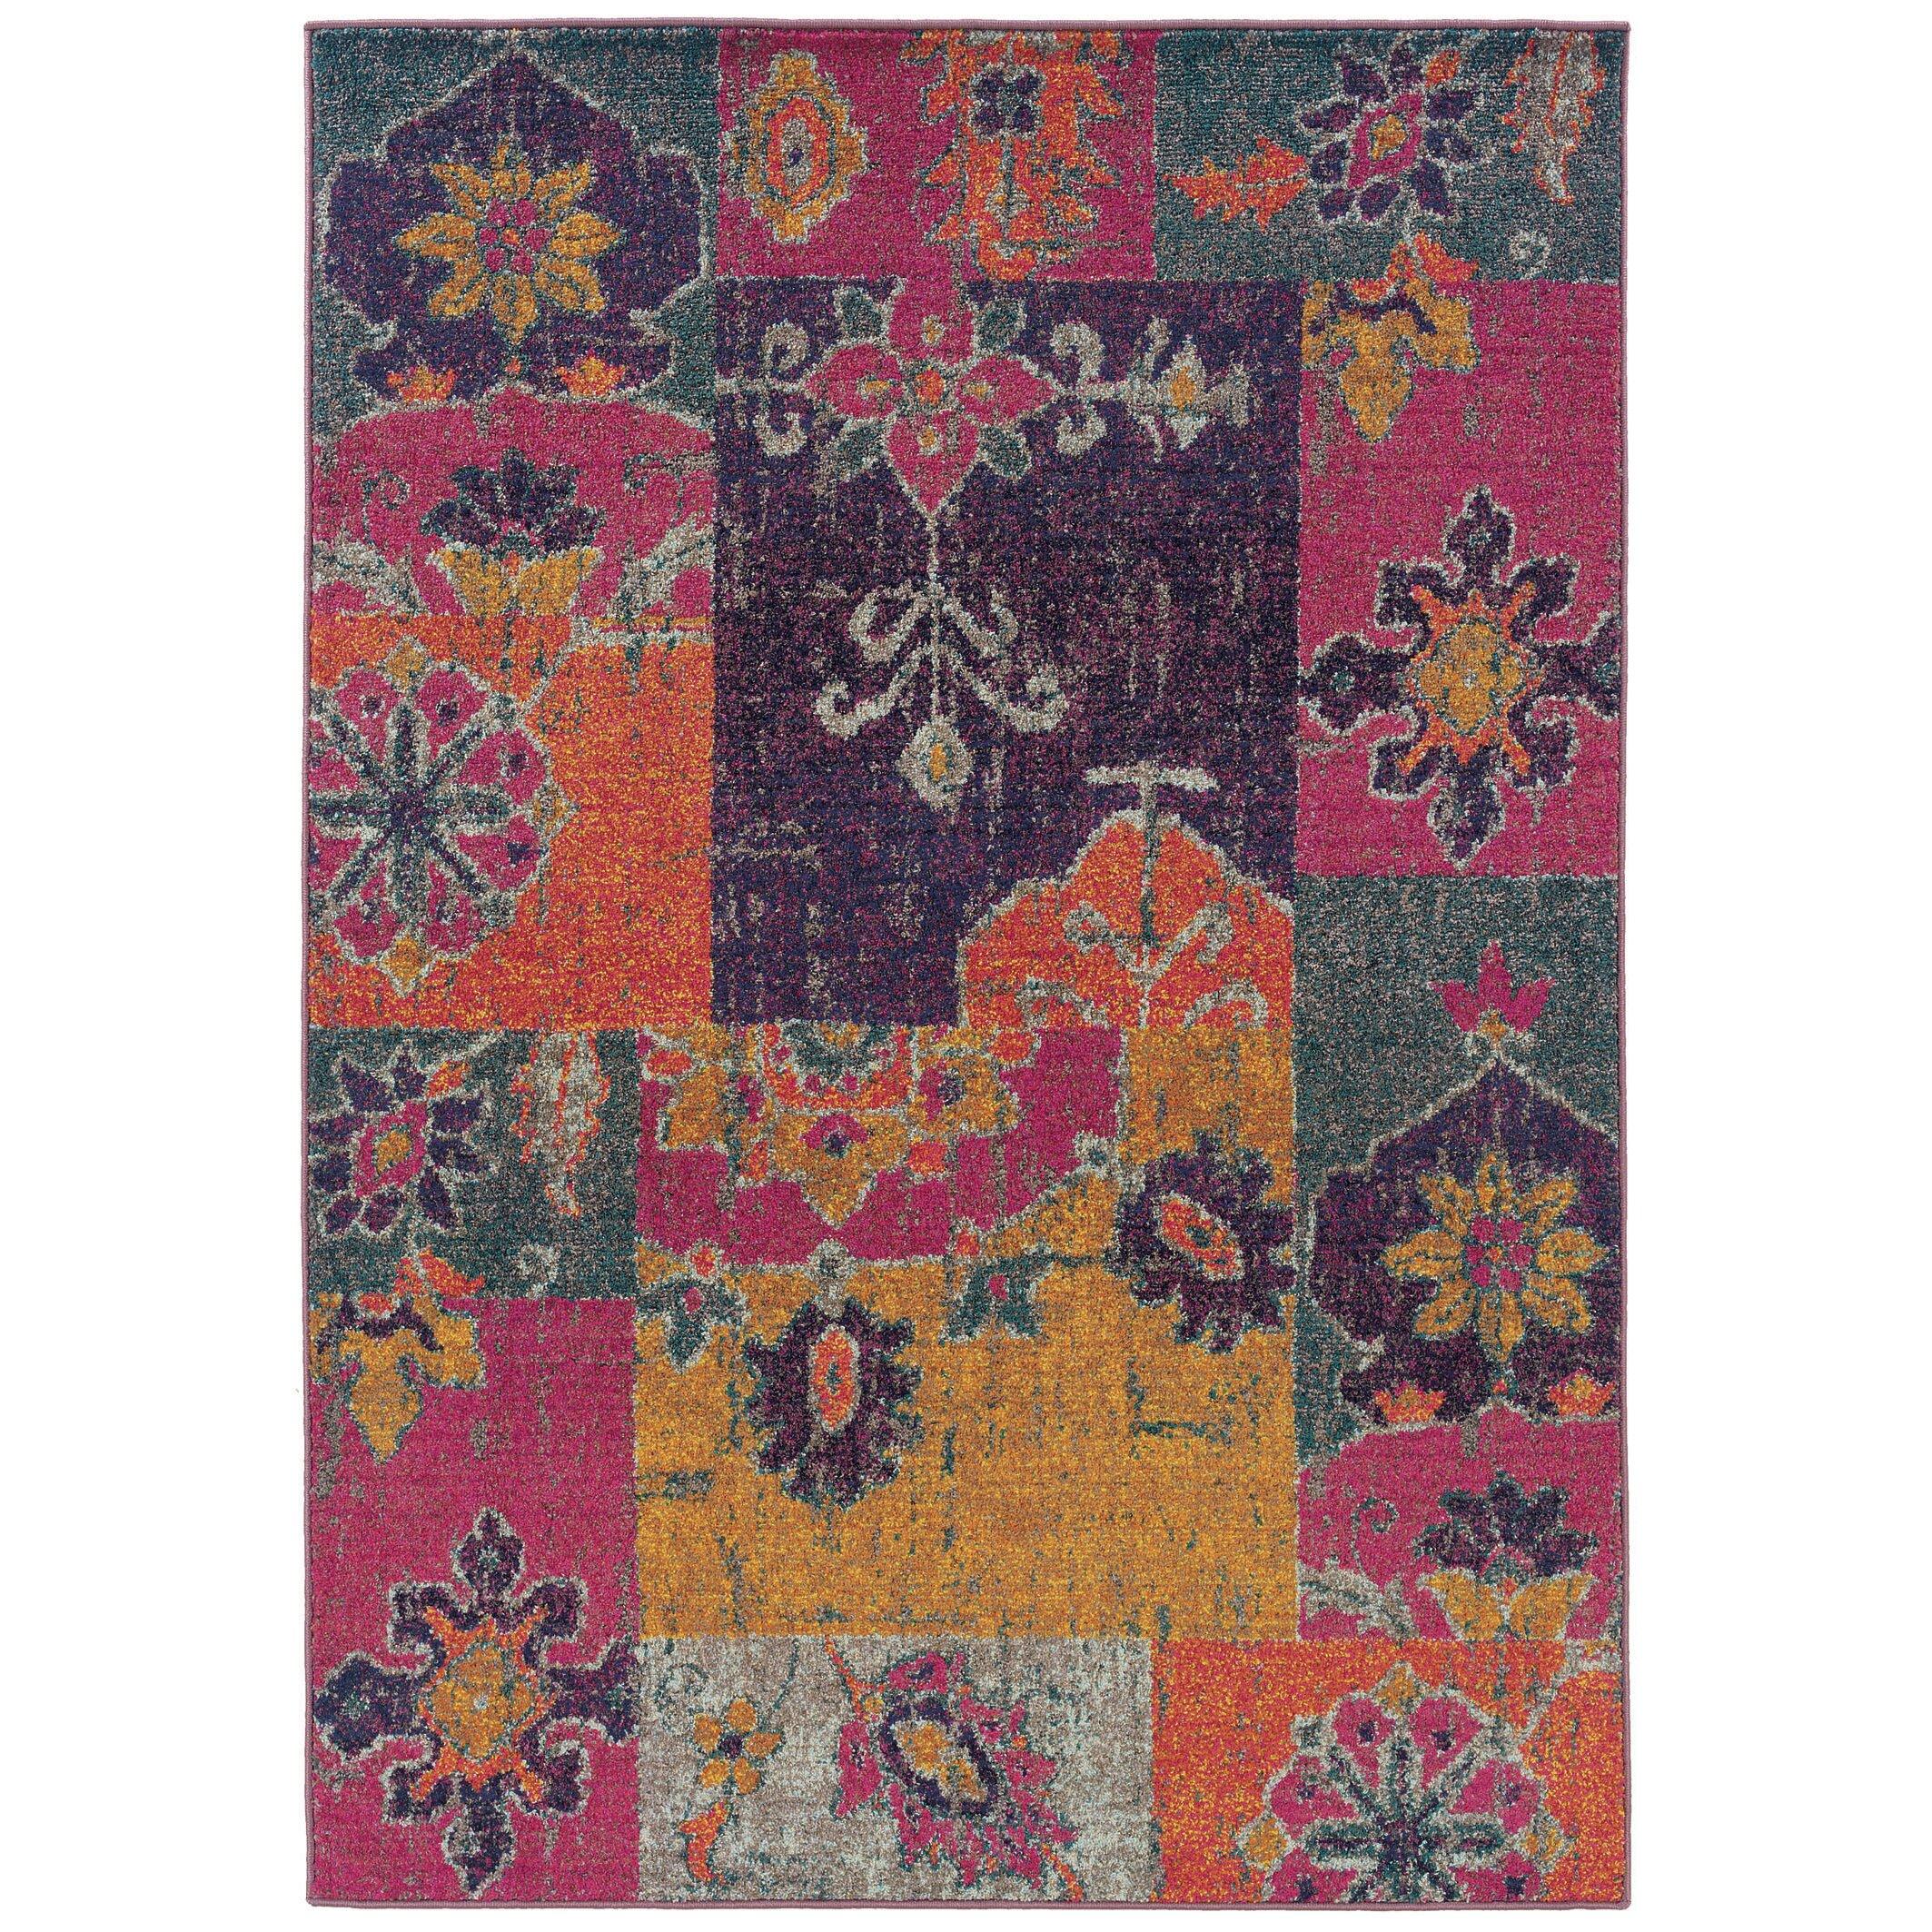 Aura Floral Ikat Multi/Pink Area Rug